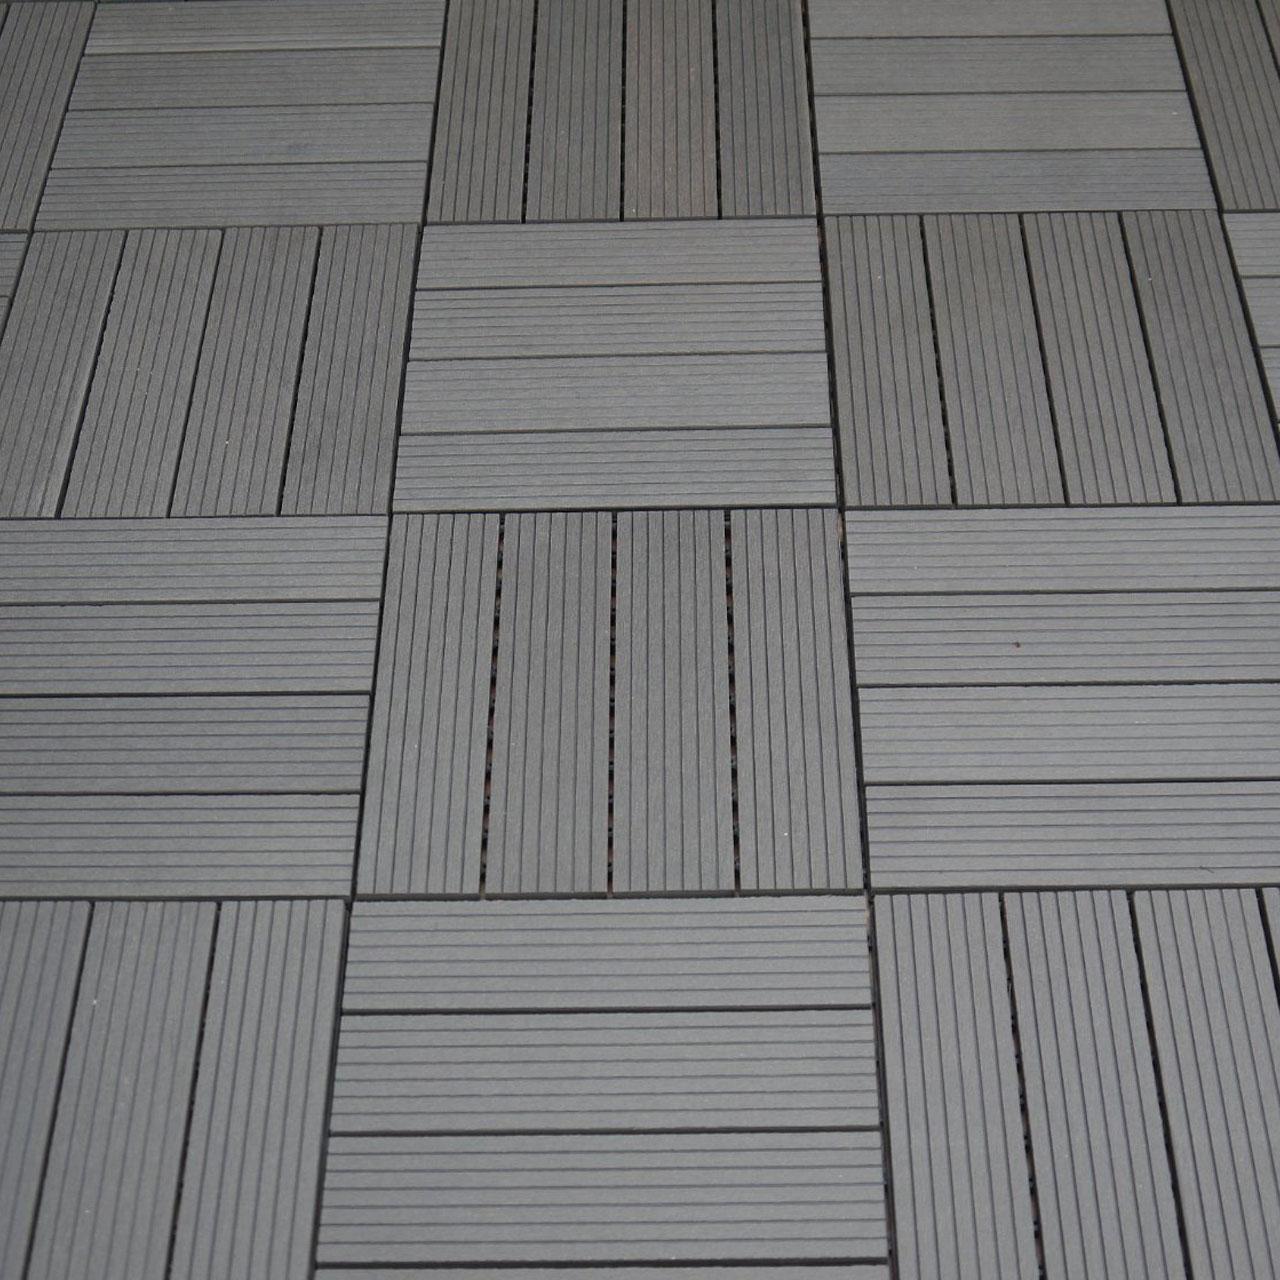 Häufig Bretter Kunststoff. Amazing Kunststoff Holz Bretter Wohn Design IZ83